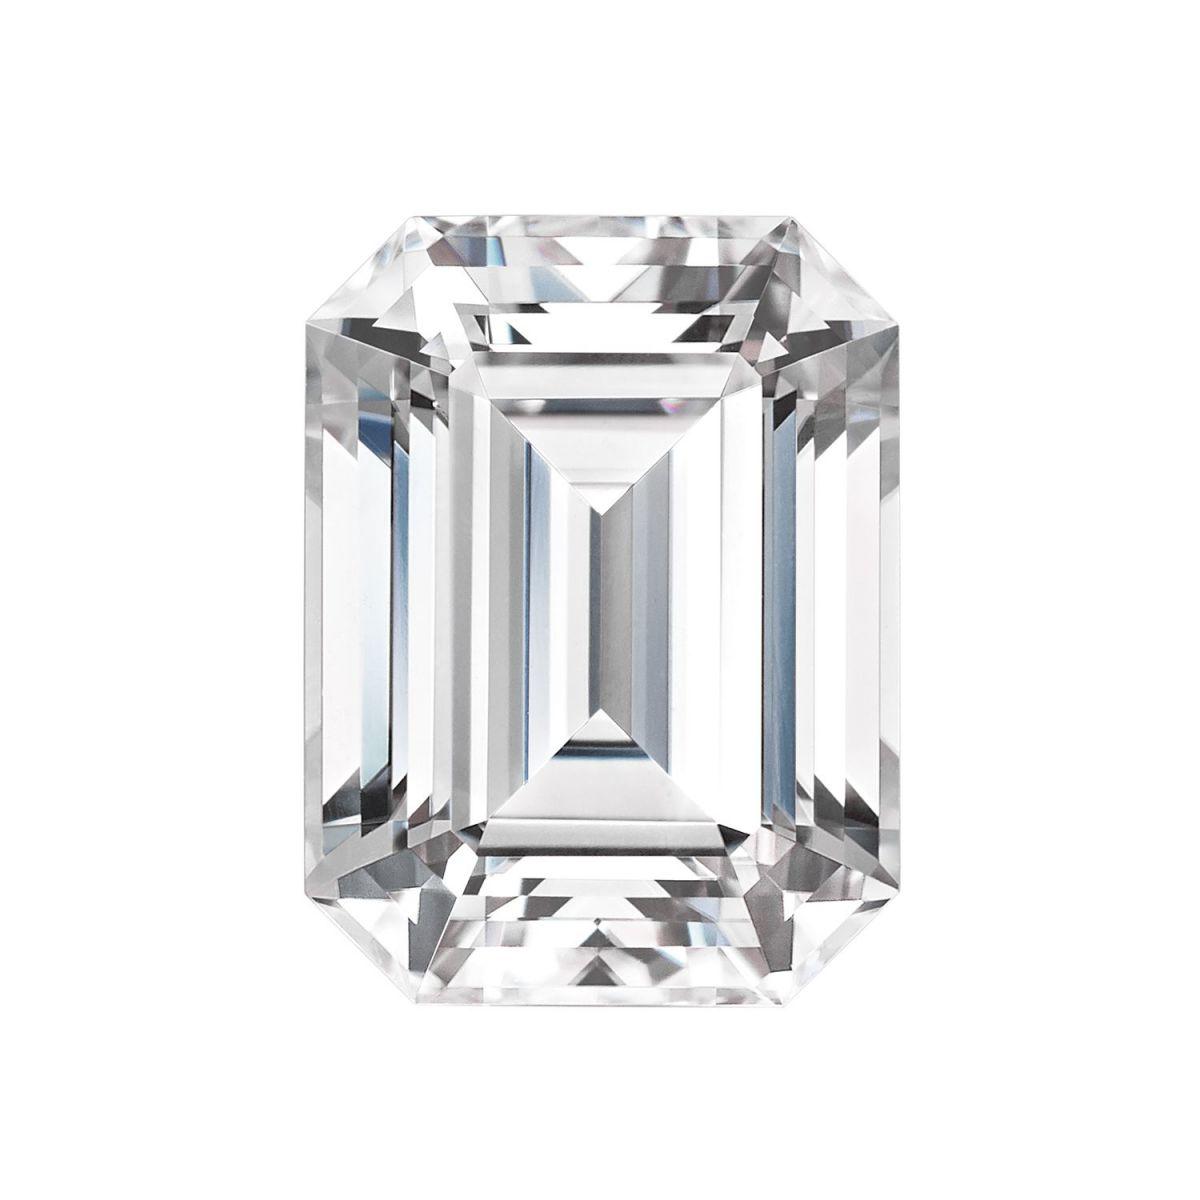 https://www.loveandpromisejewelers.com/media/catalog/product/cache/feefdef027ccf0d59dd1fef51db0610e/e/m/emerald_moissanite_image.jpg